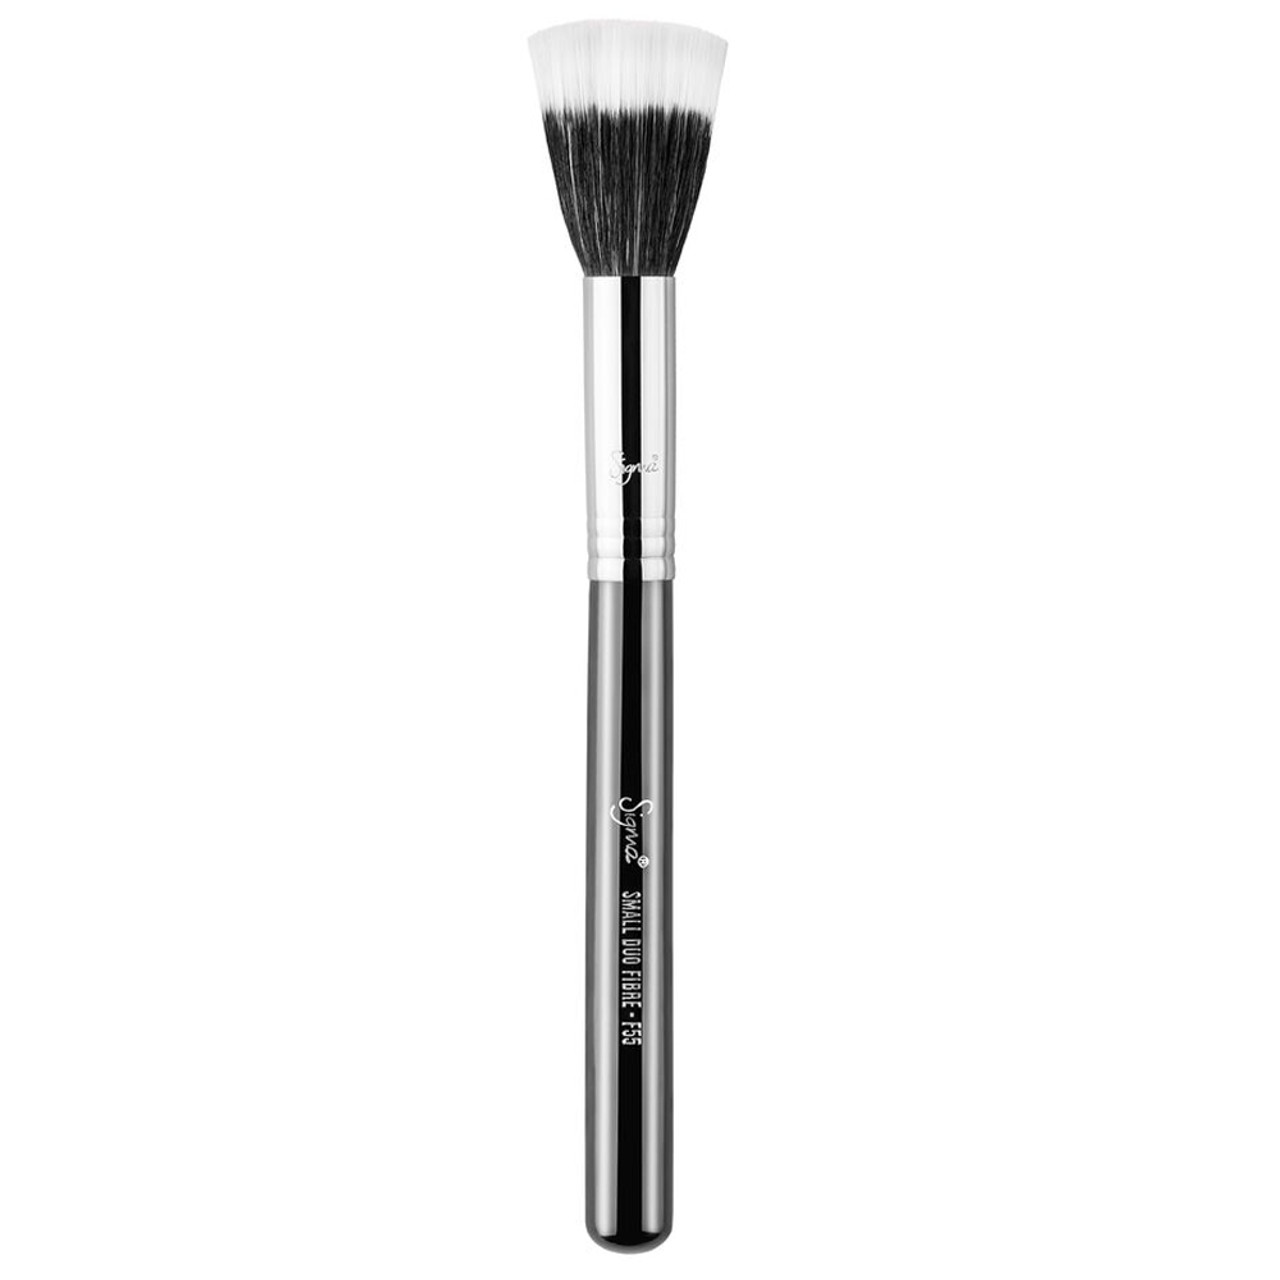 Sigma Beauty F55 - Small Duo Fibre Brush